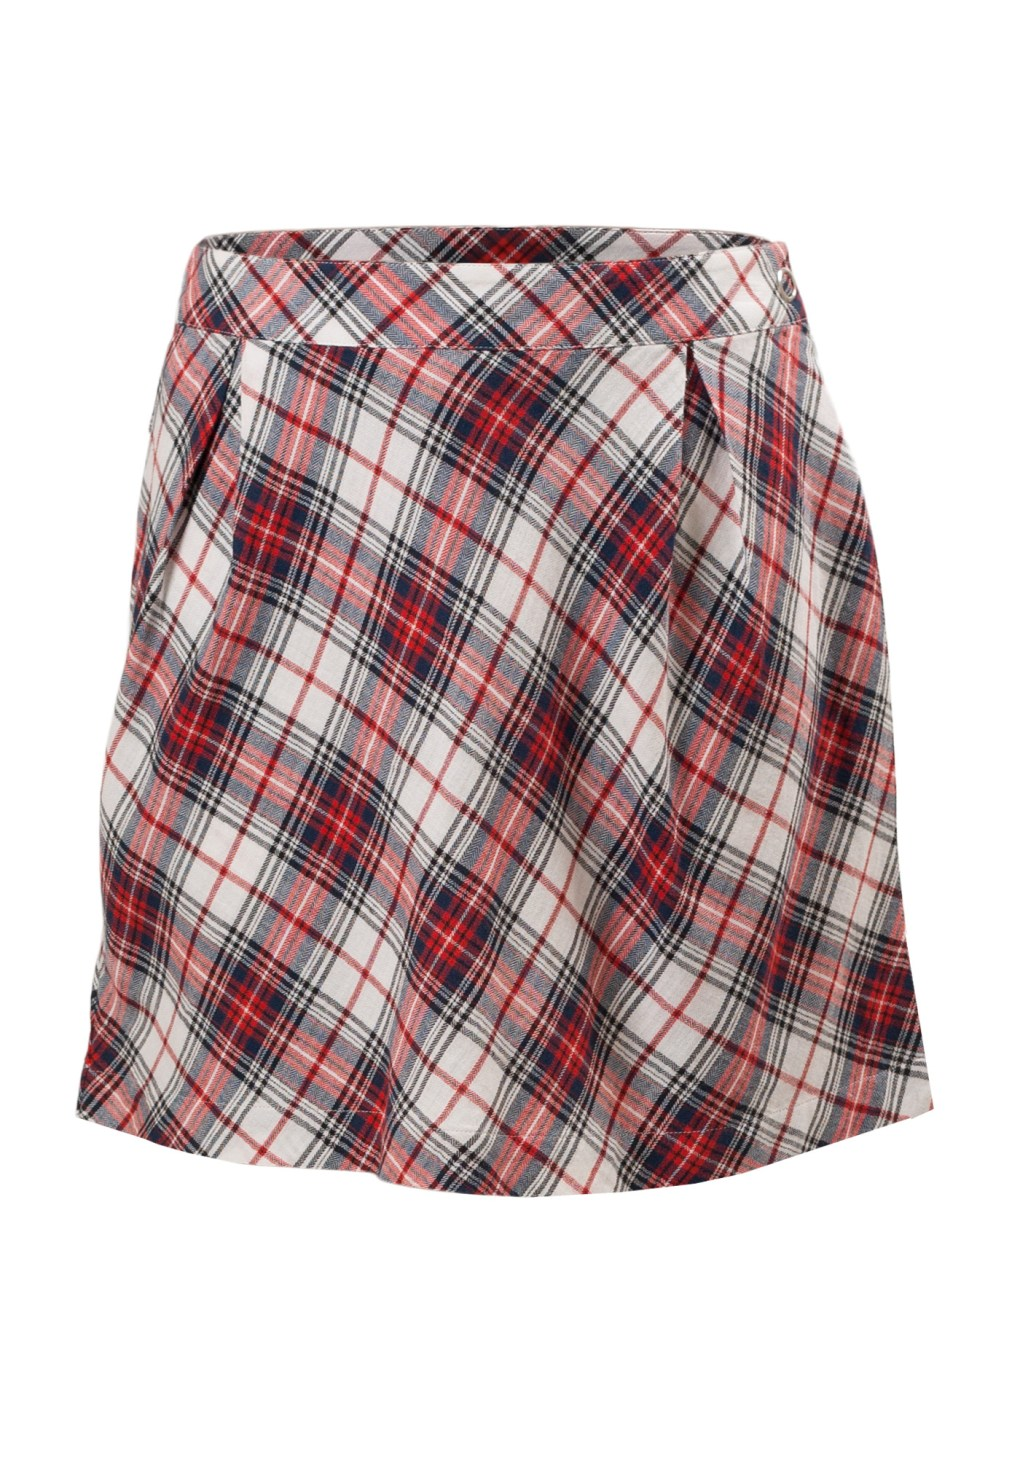 MINC Petite Tartan Girls Skorts in Red, White and Blue Yarn Dyed Cotton Checks